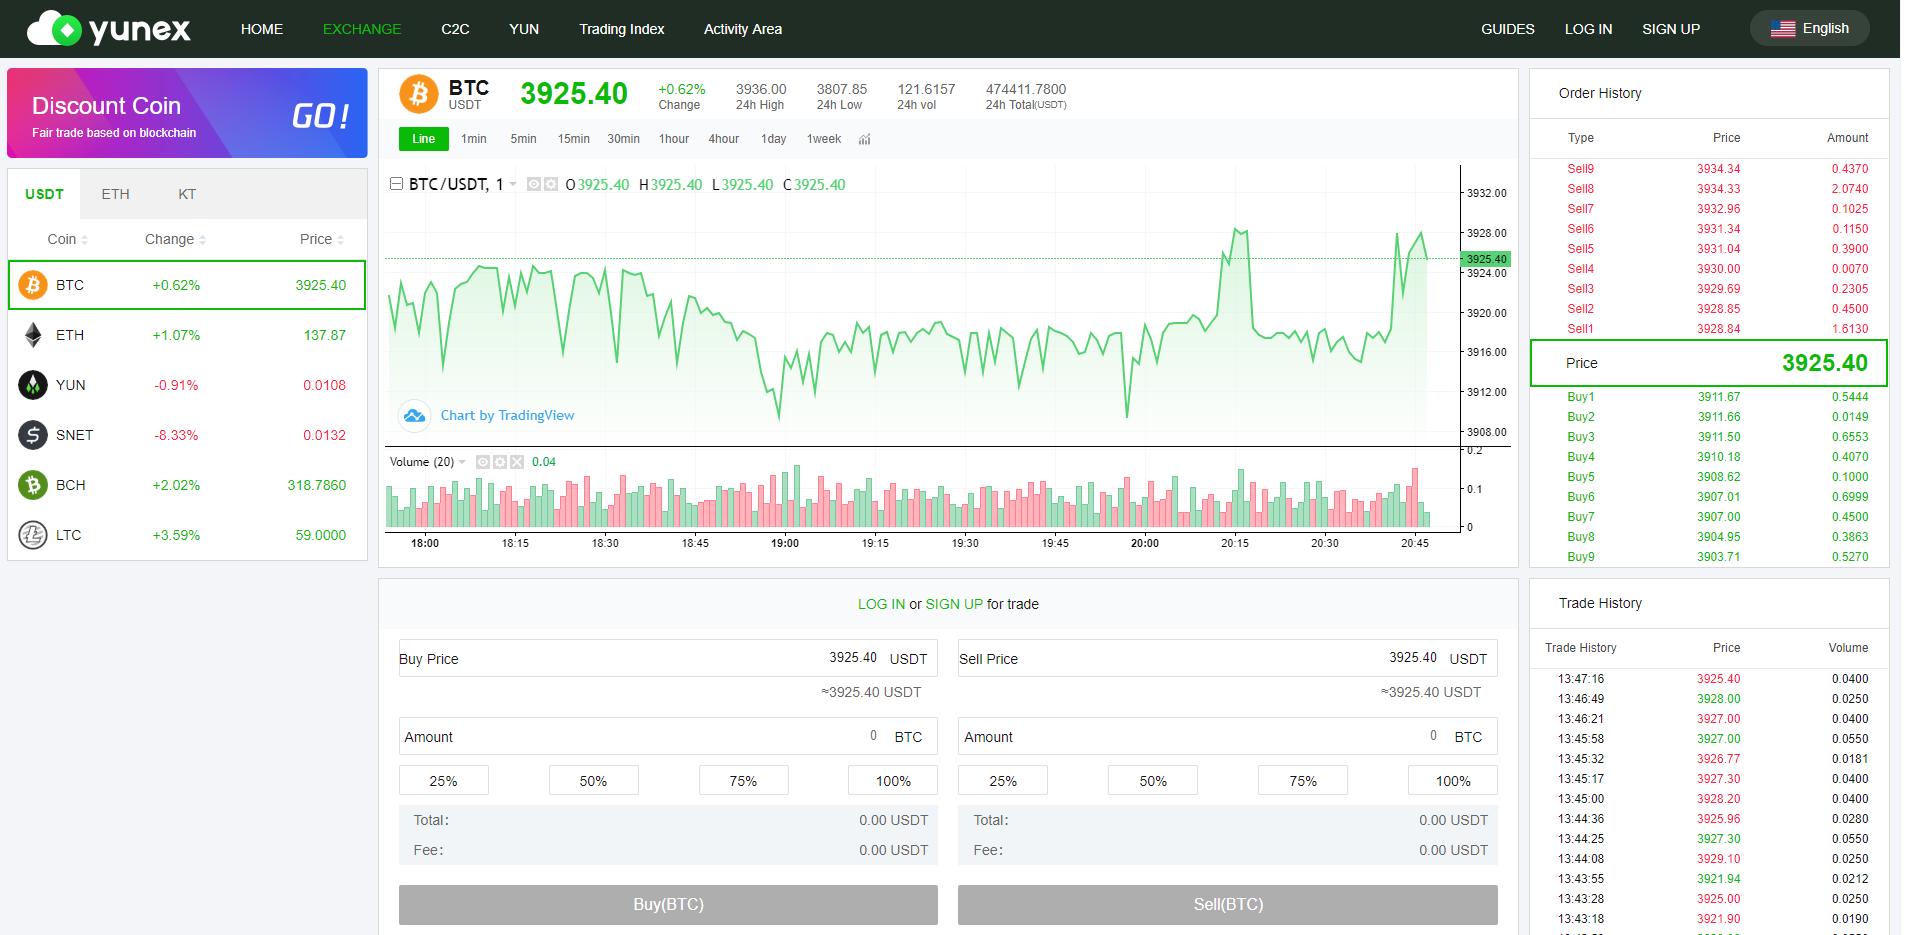 YunEx Trading View